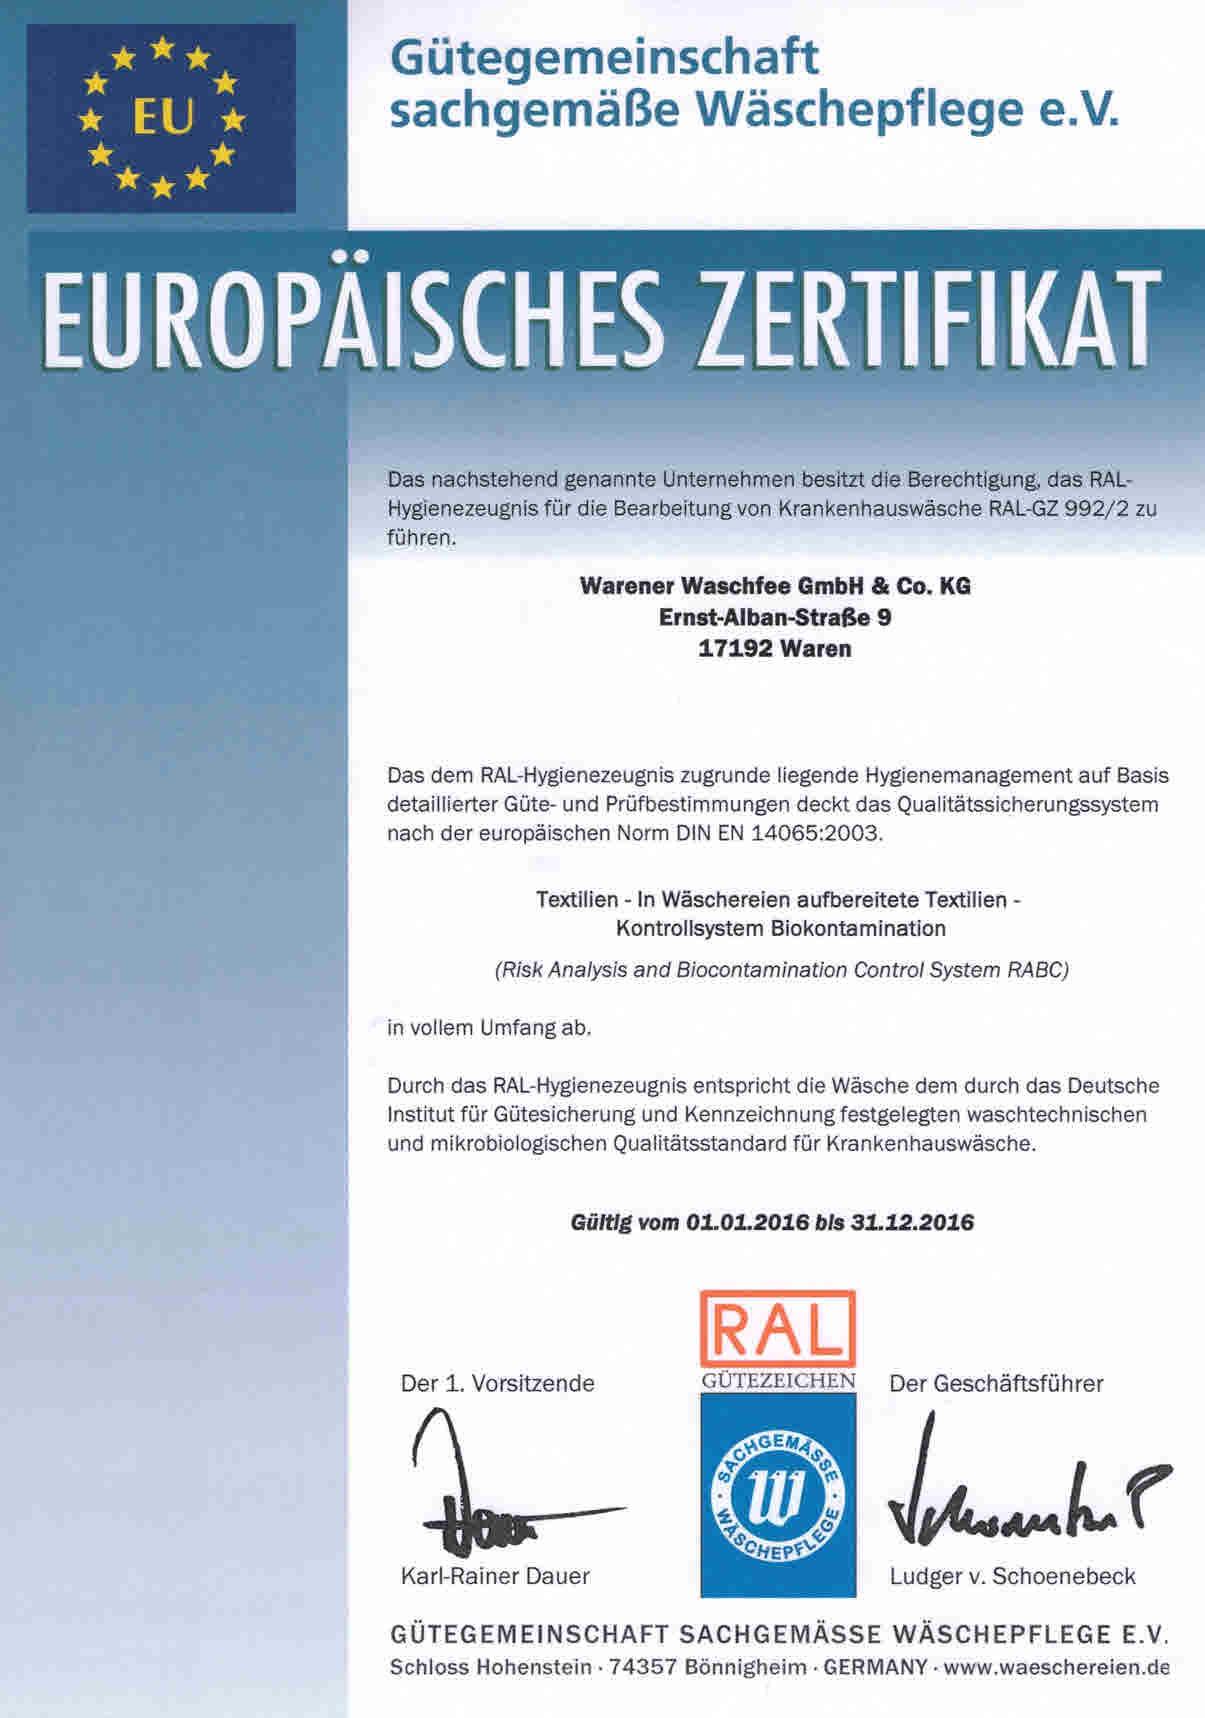 Europ_Zertifikat_GZ_992-2